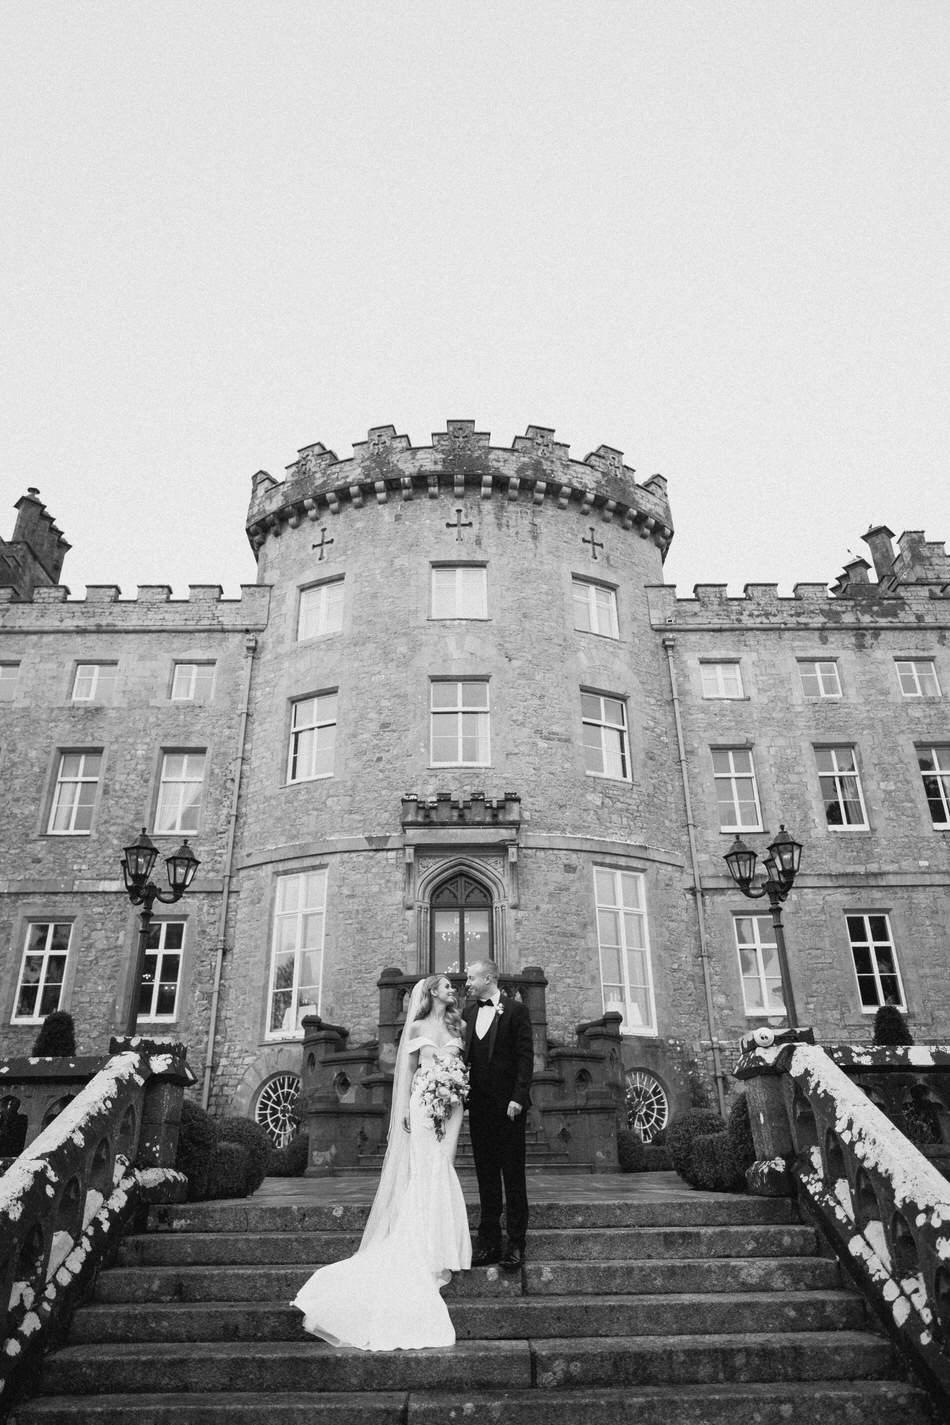 Castle-wedding-ireland-photos- 0186 132